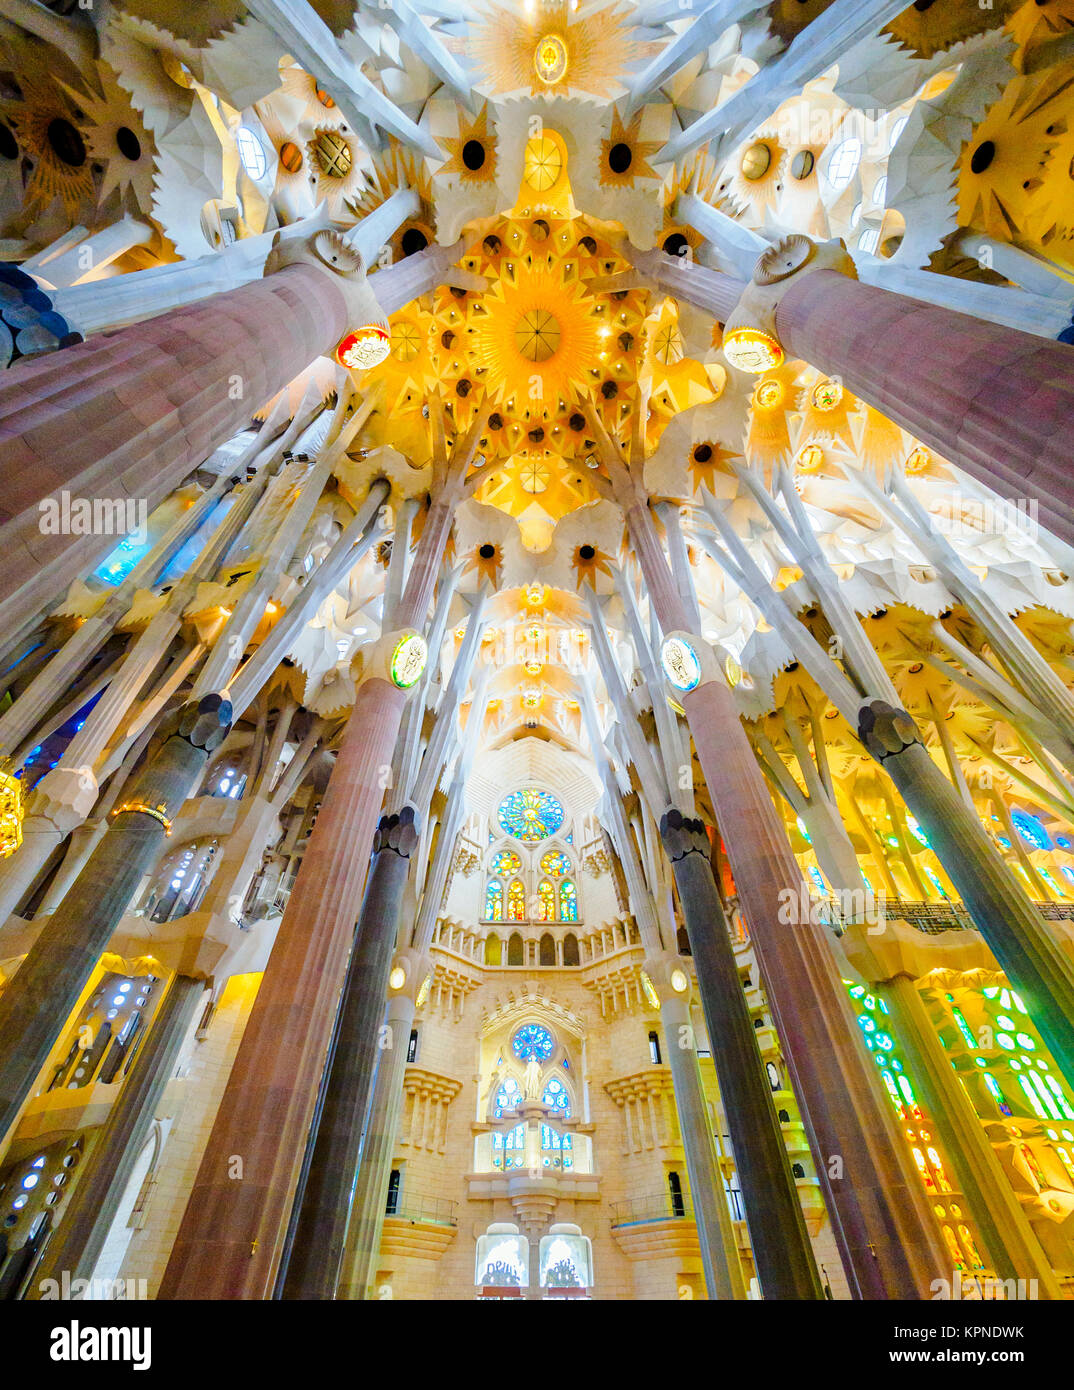 The Basilica i Temple Expiatori de la Sagrada Familia designed by Spanish architect Antoni Gaudi -  Barcelona, Spain - Stock Image